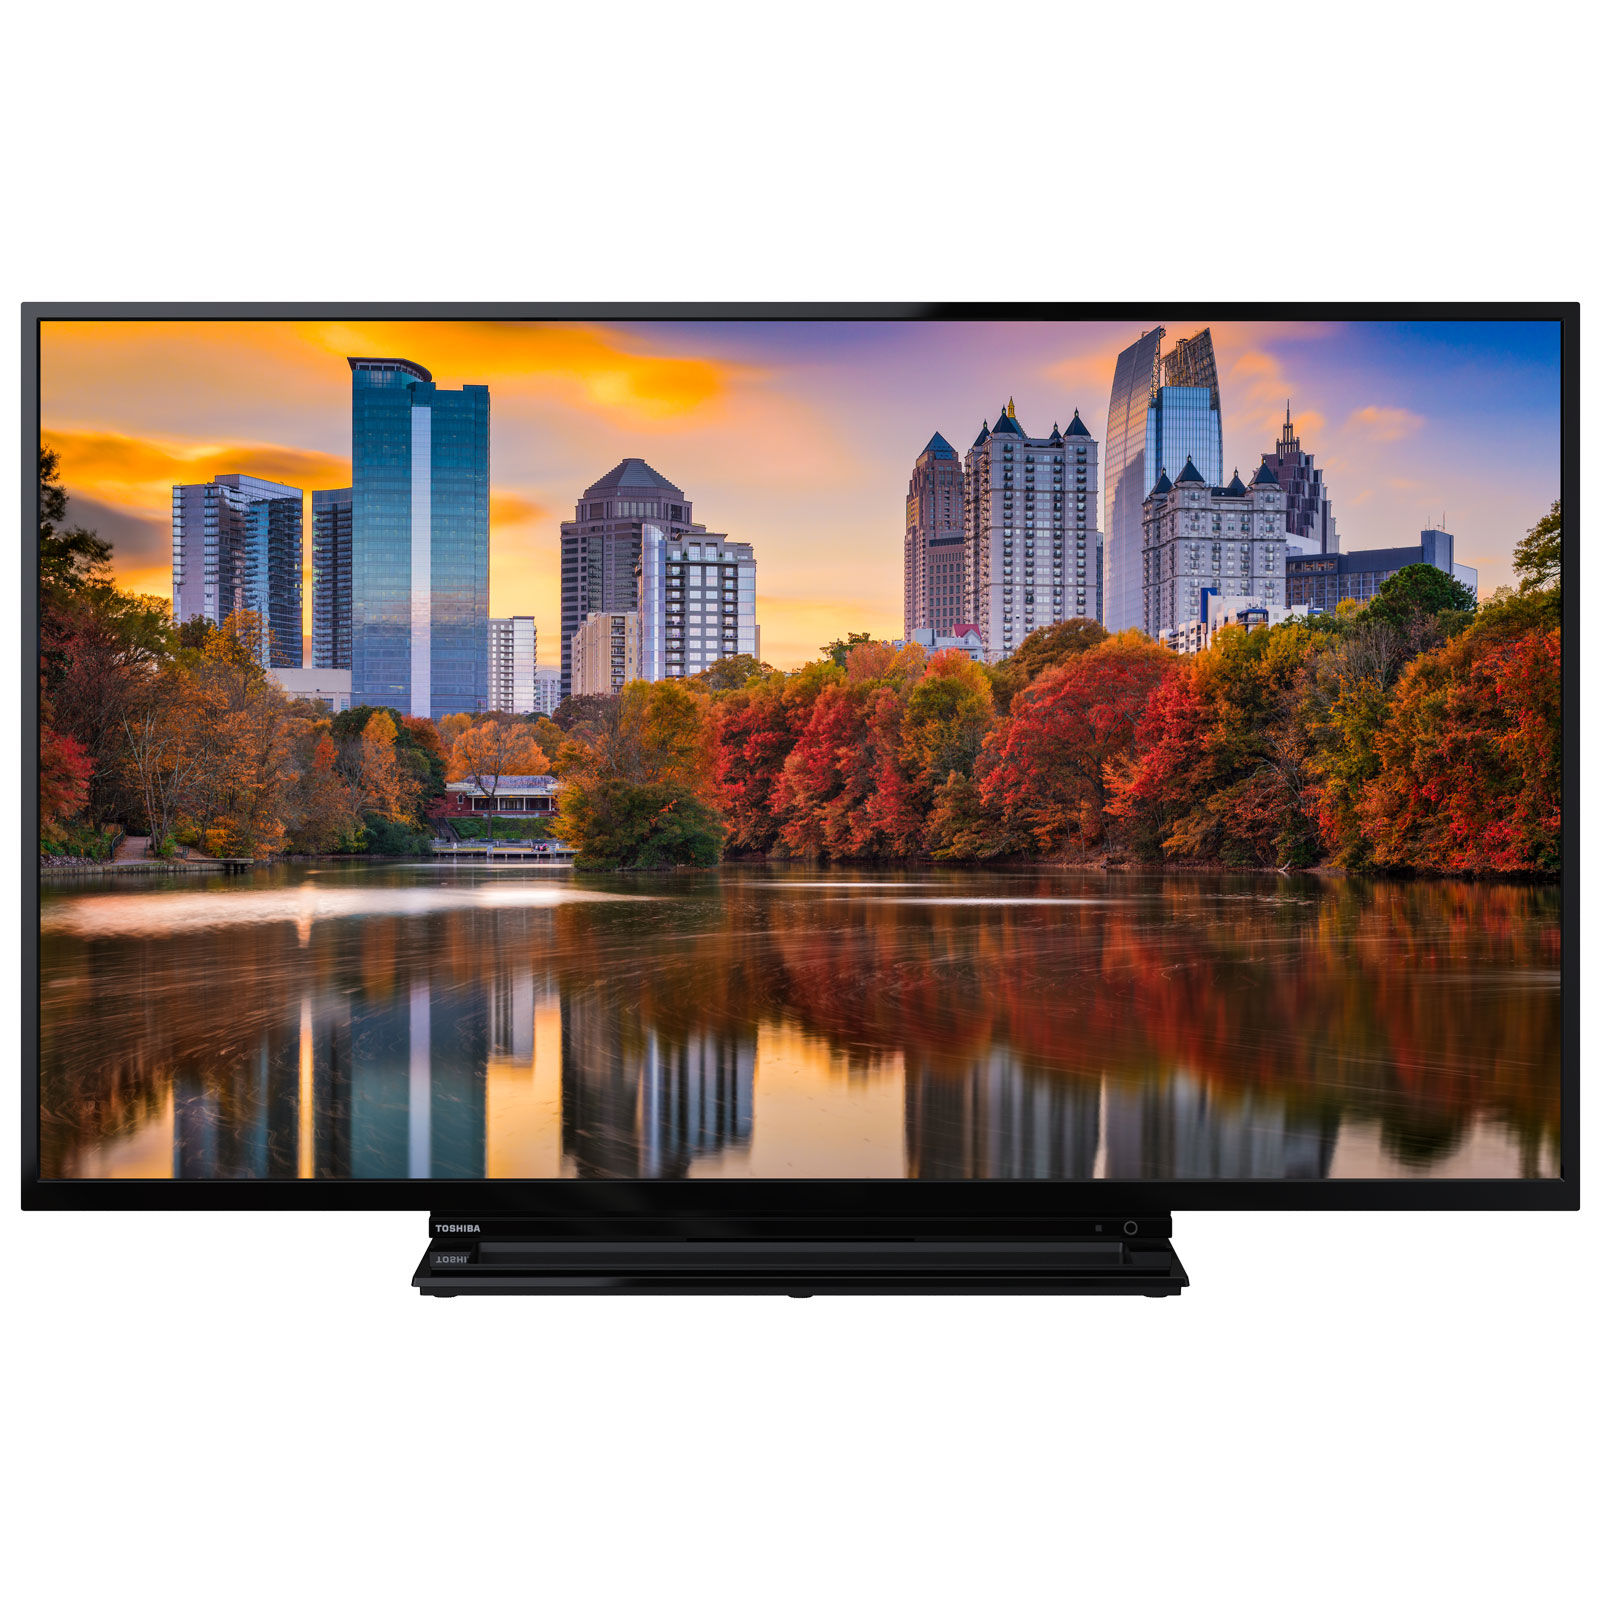 "TV Toshiba 43V5863DG Téléviseur LED 4K 43"" (109 cm) 16/9 - 3840 x 2160 pixels - Ultra HD 2160p - HDR - Wi-Fi - 1700 Hz"